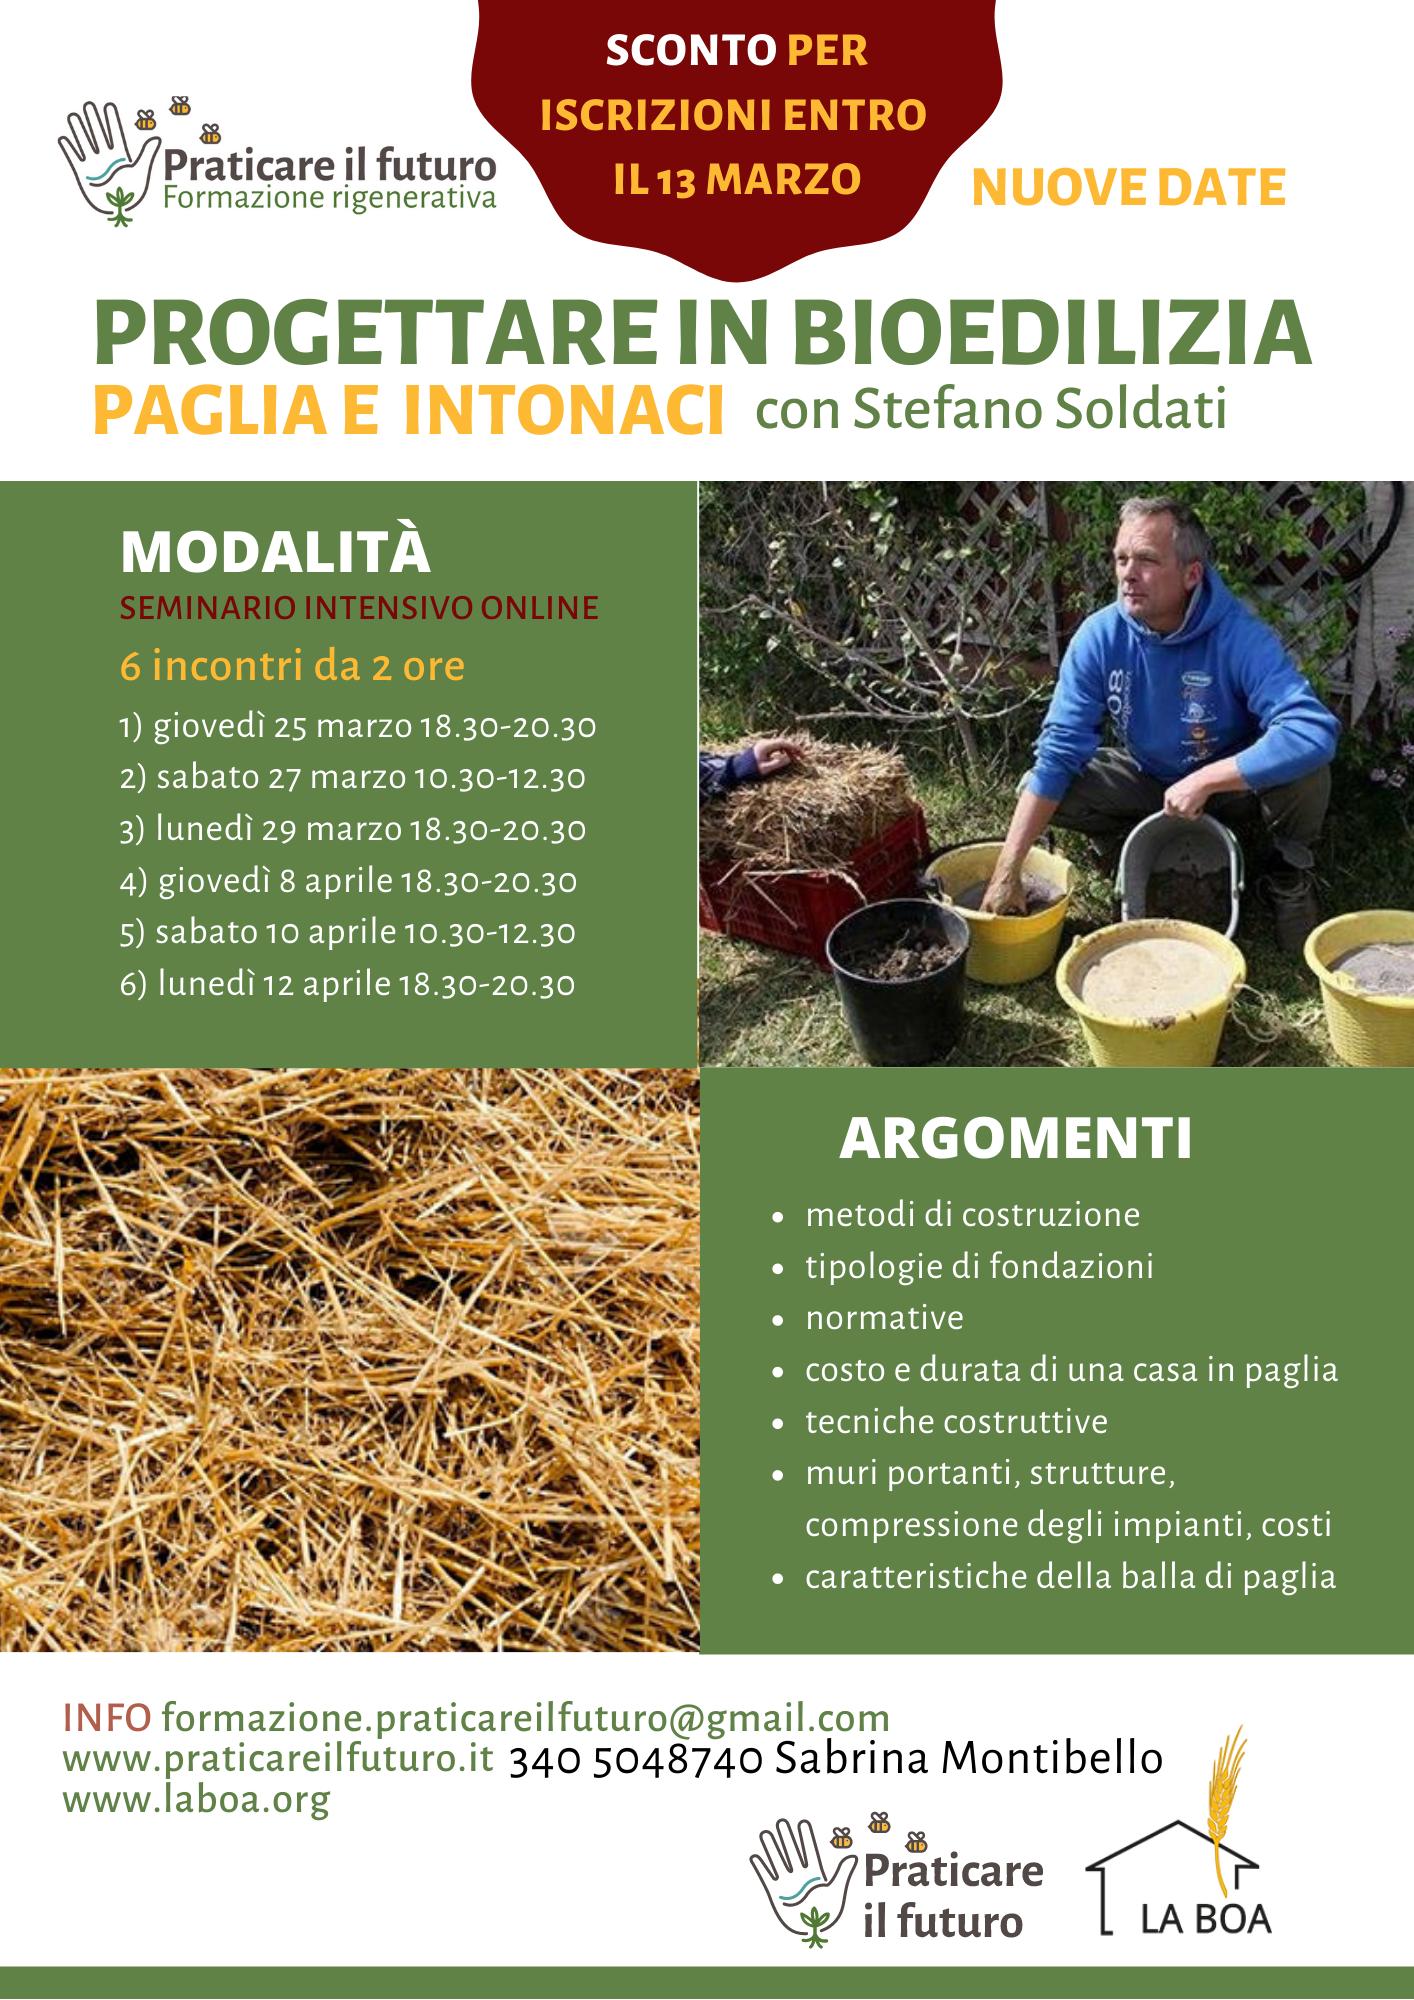 bioedilizia_paglia_soldati_praticareilfuturo_locandina